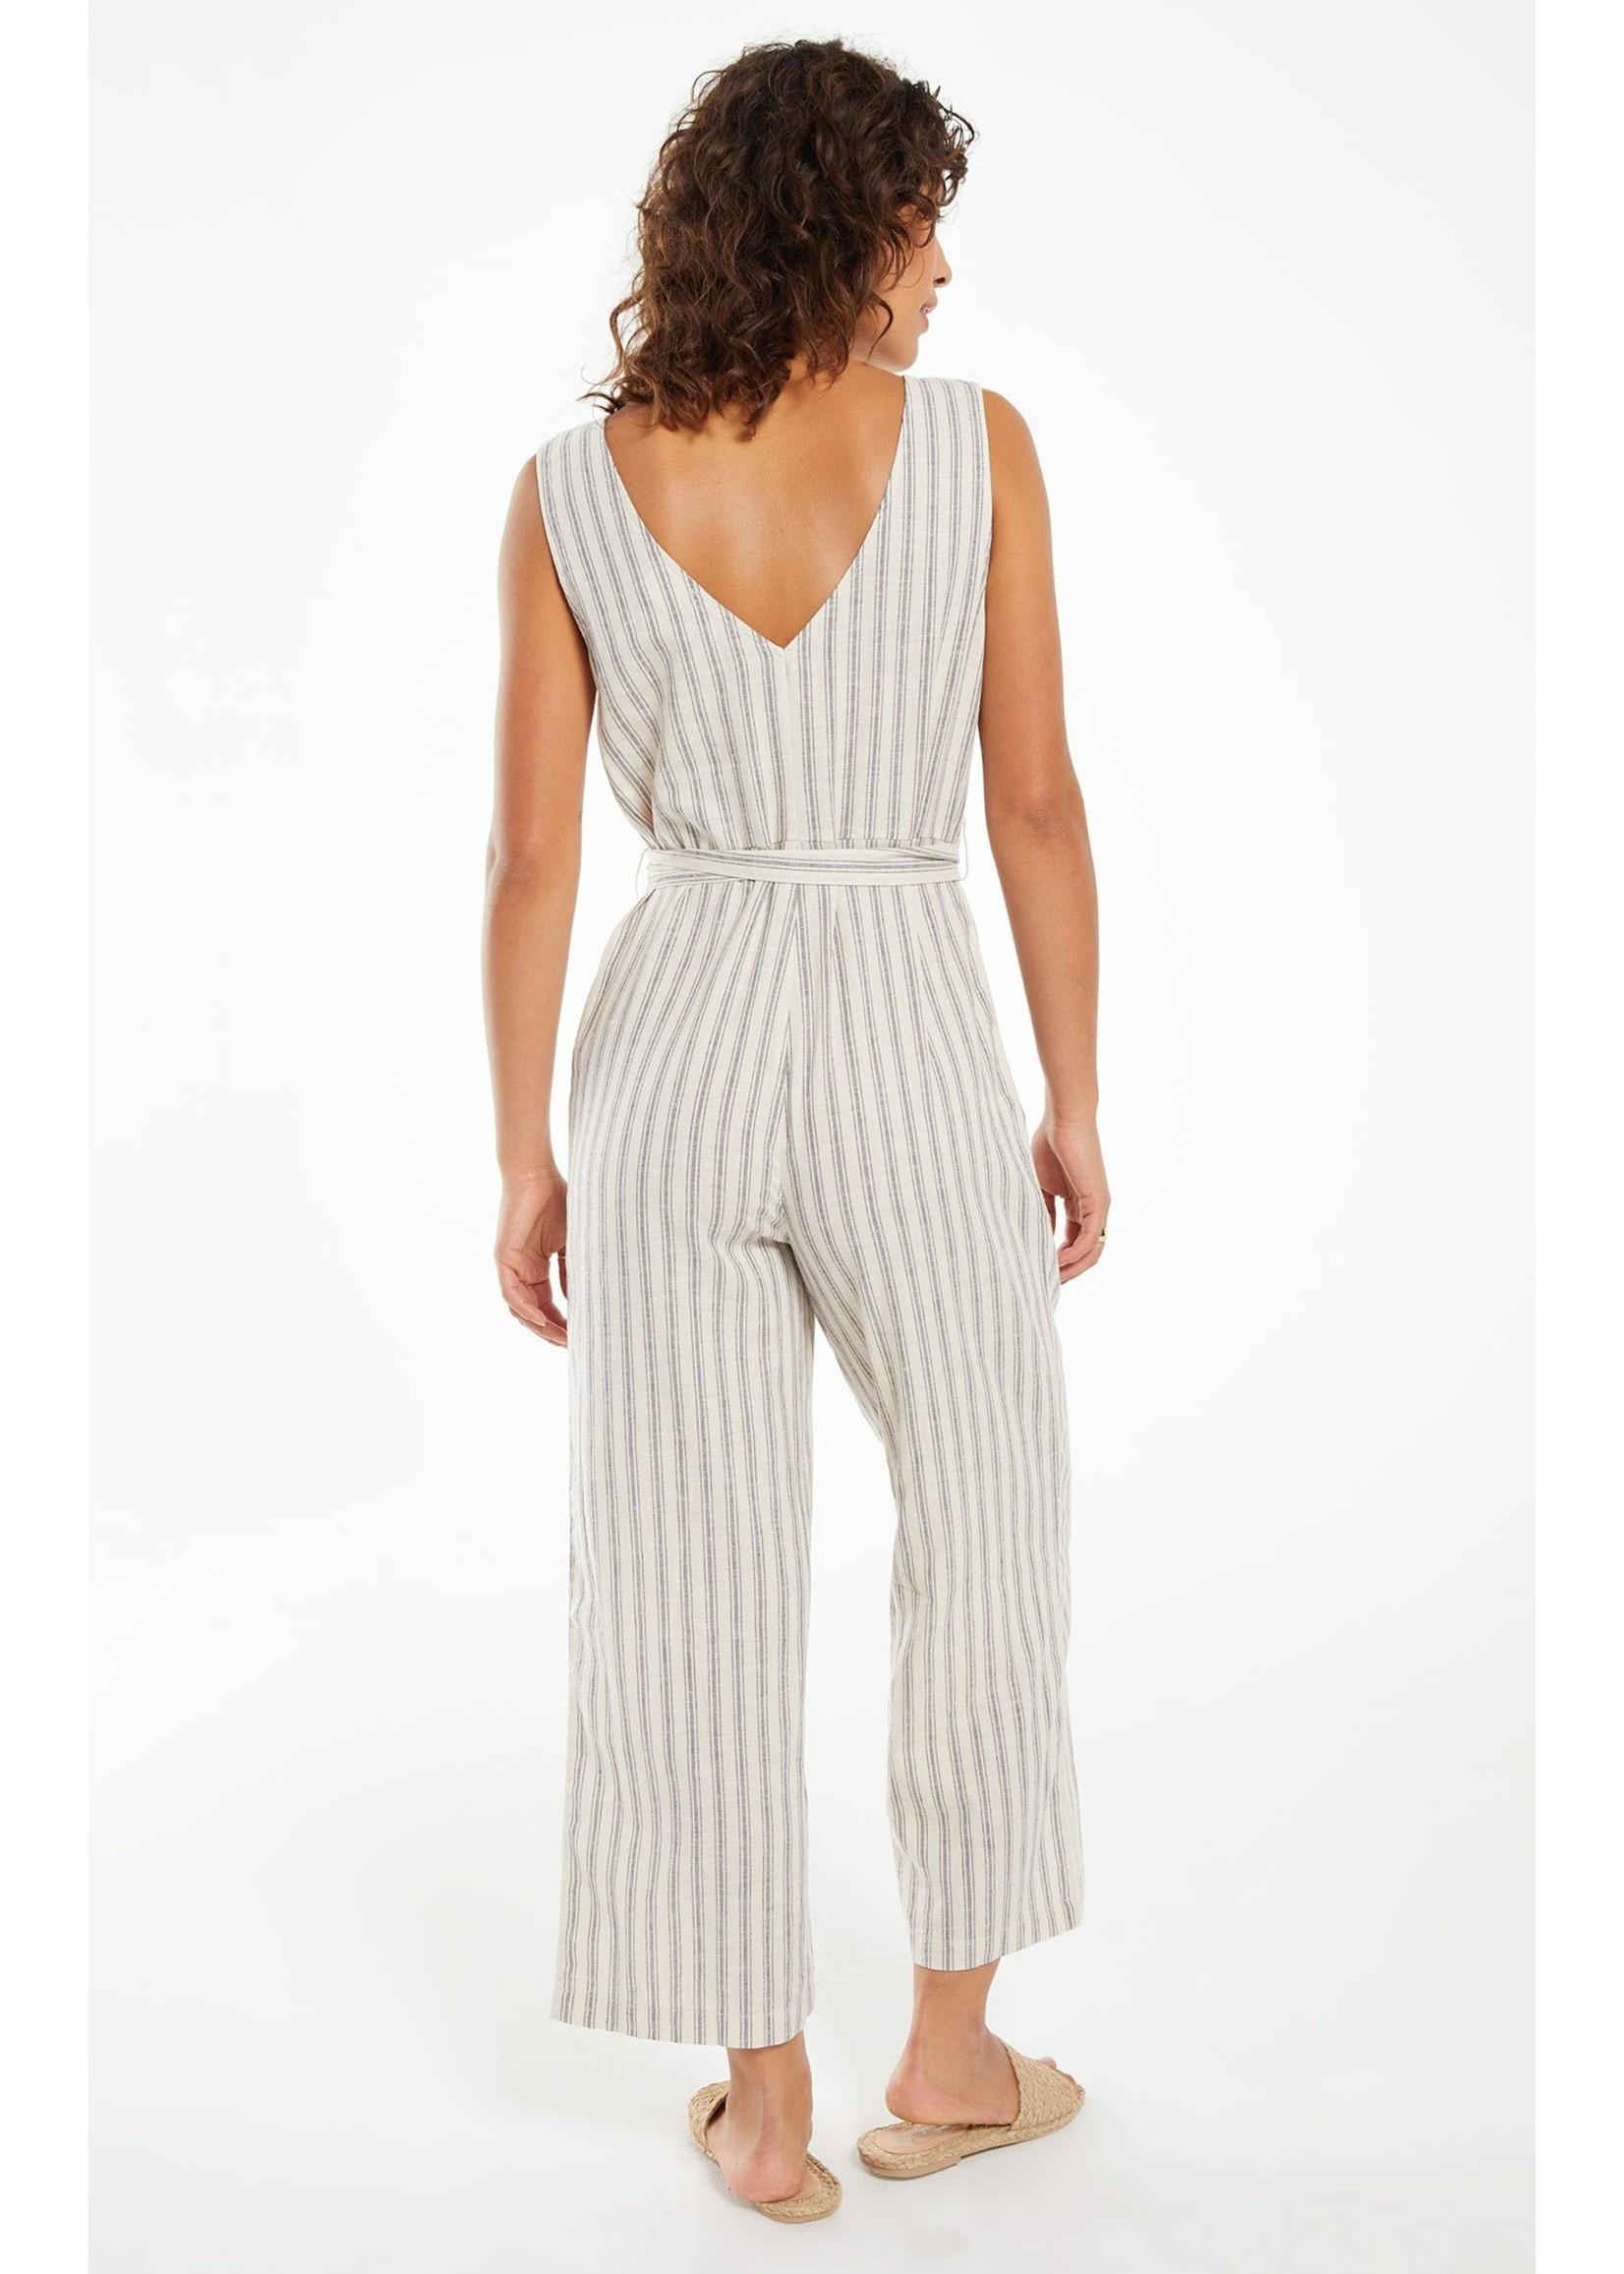 Z Supply Parade Stripe Jumpsuit